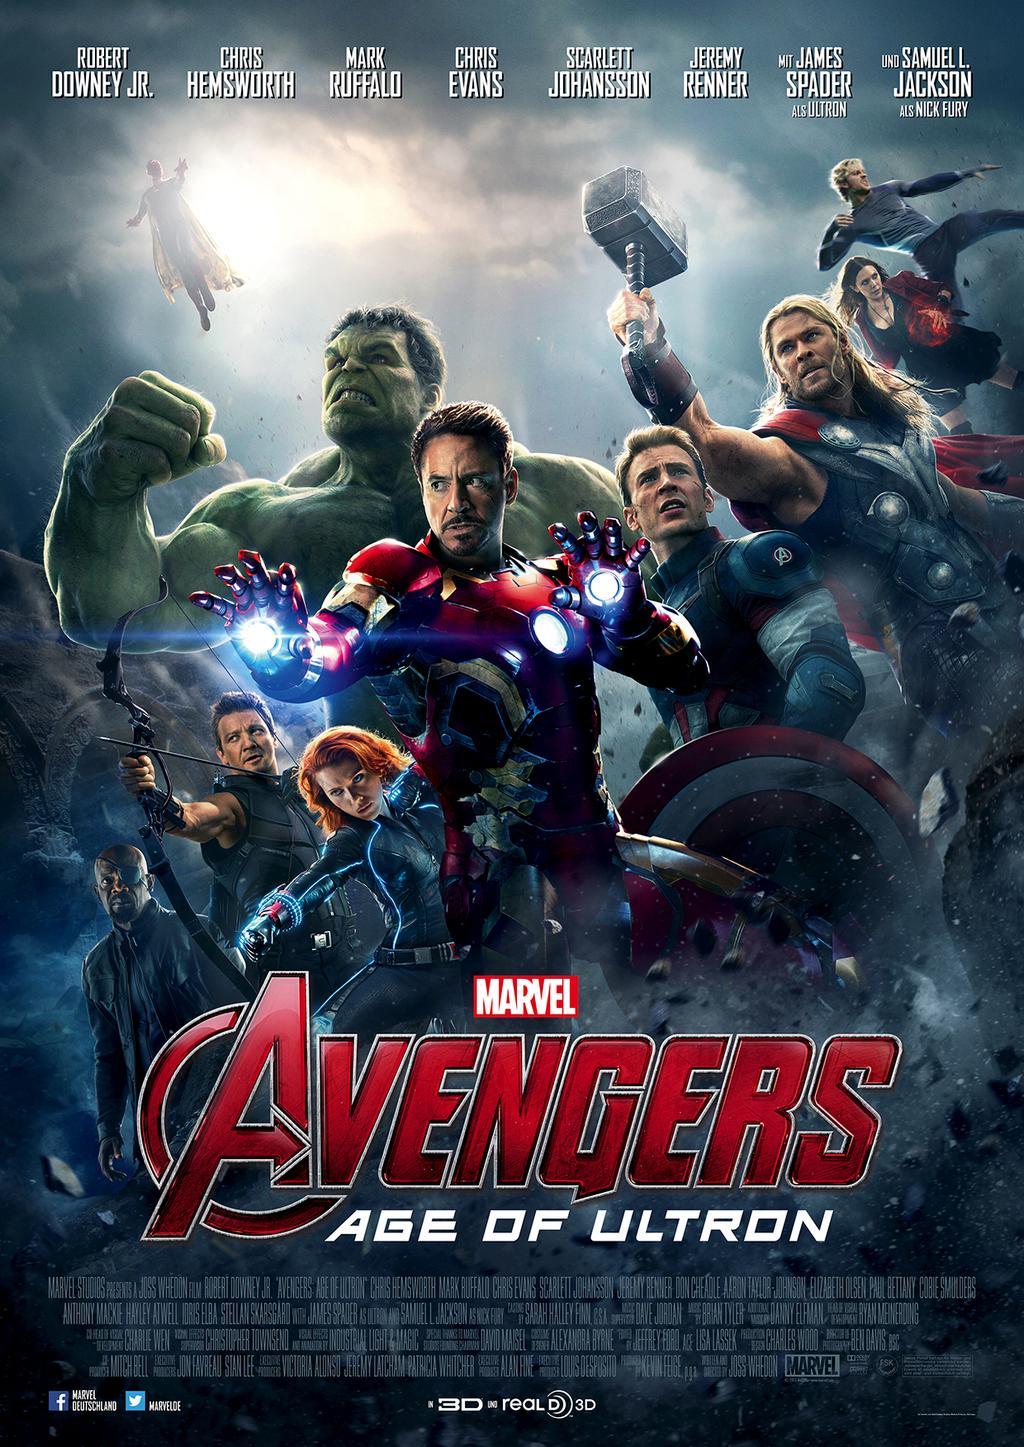 Avengers: Age of Ultron Prima Nocta